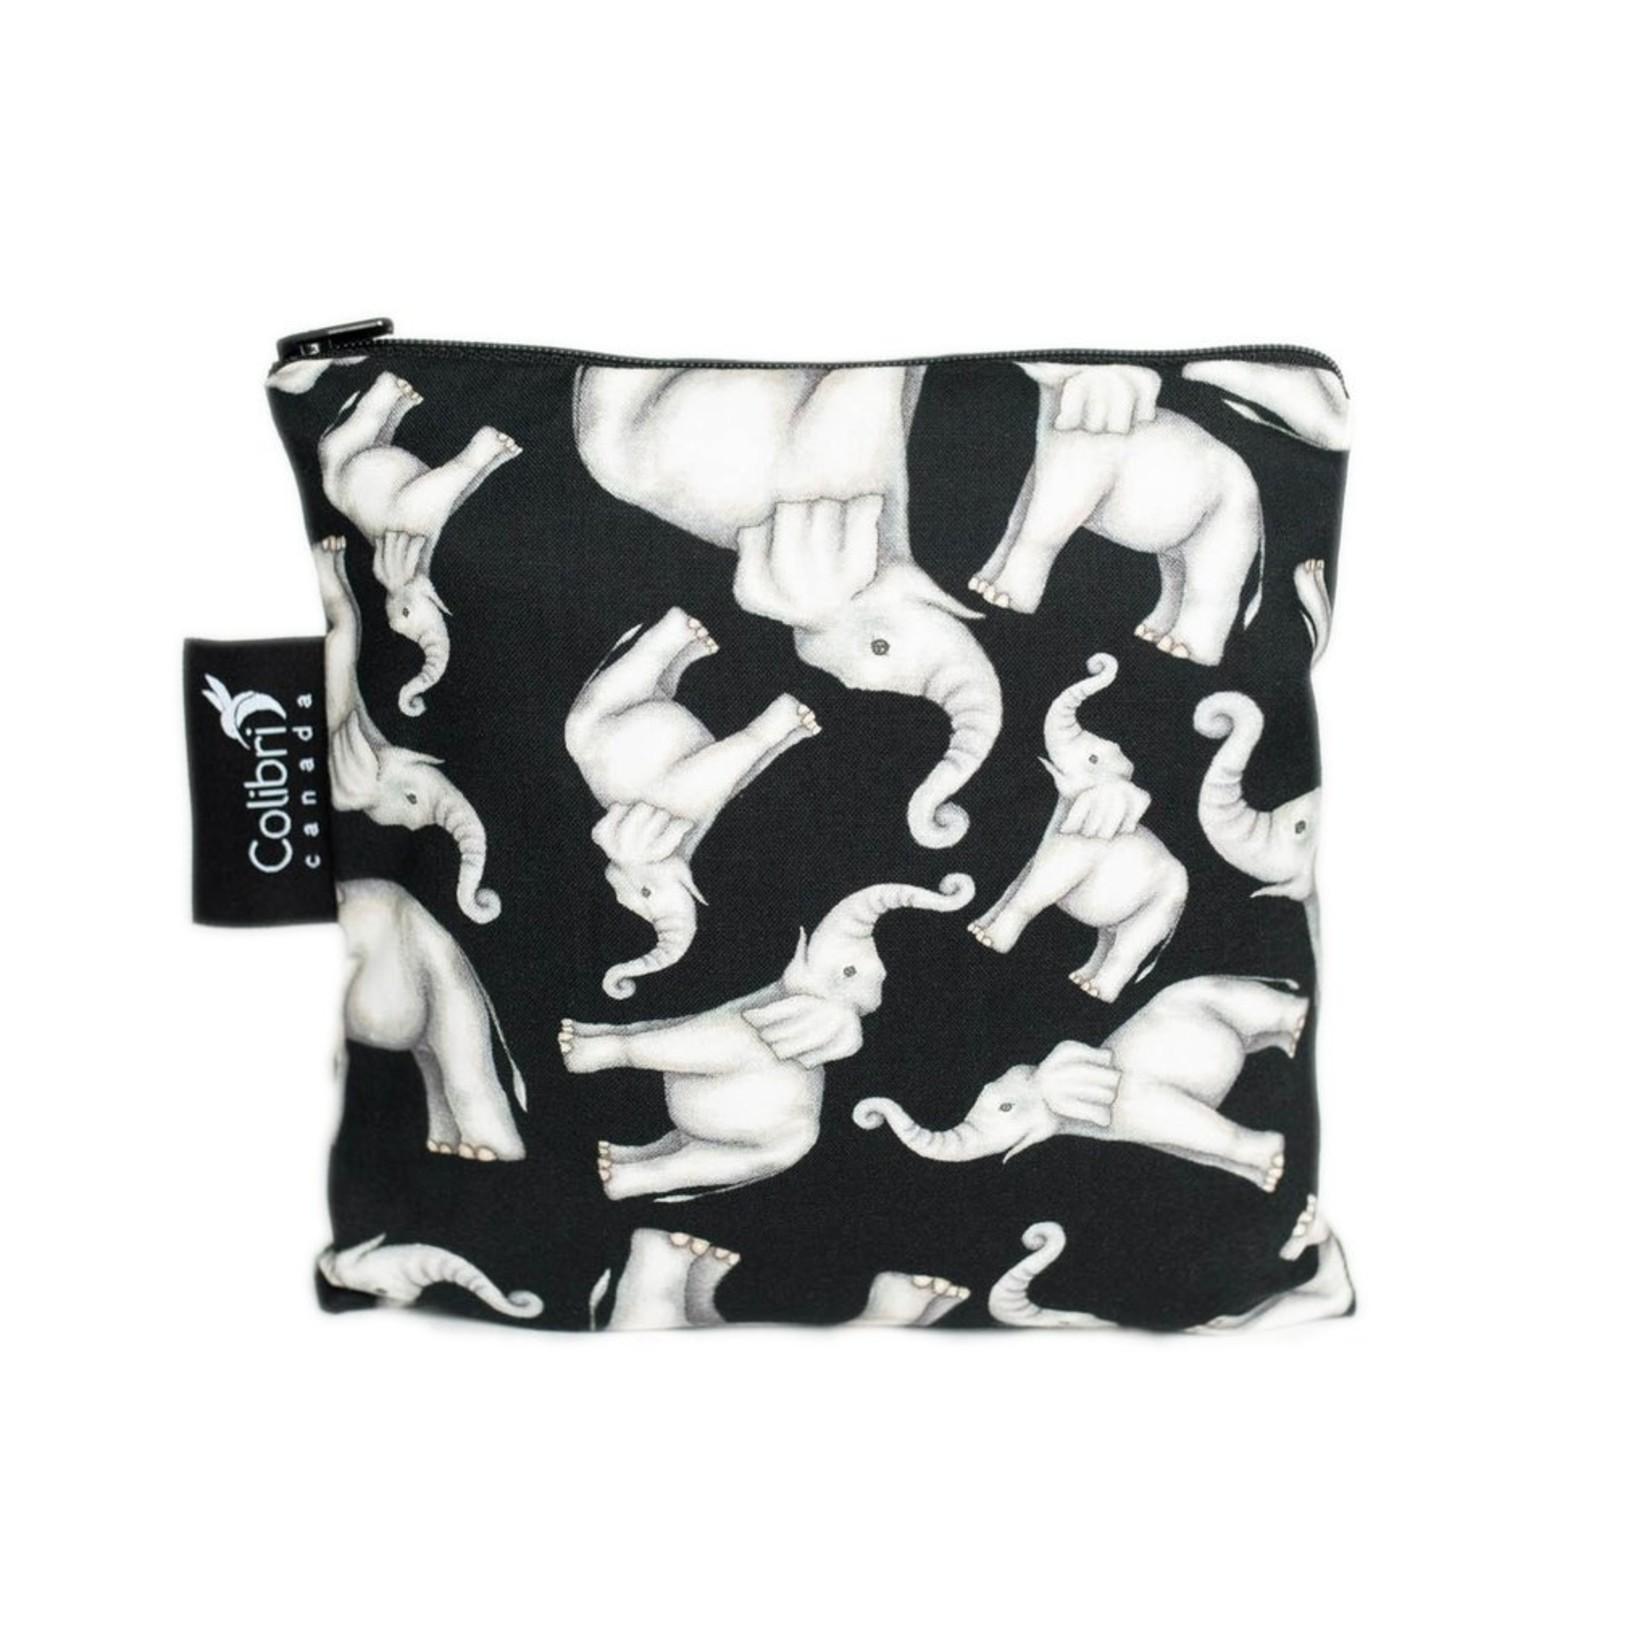 REUSABLE SNACK BAGS - ELEPHANT